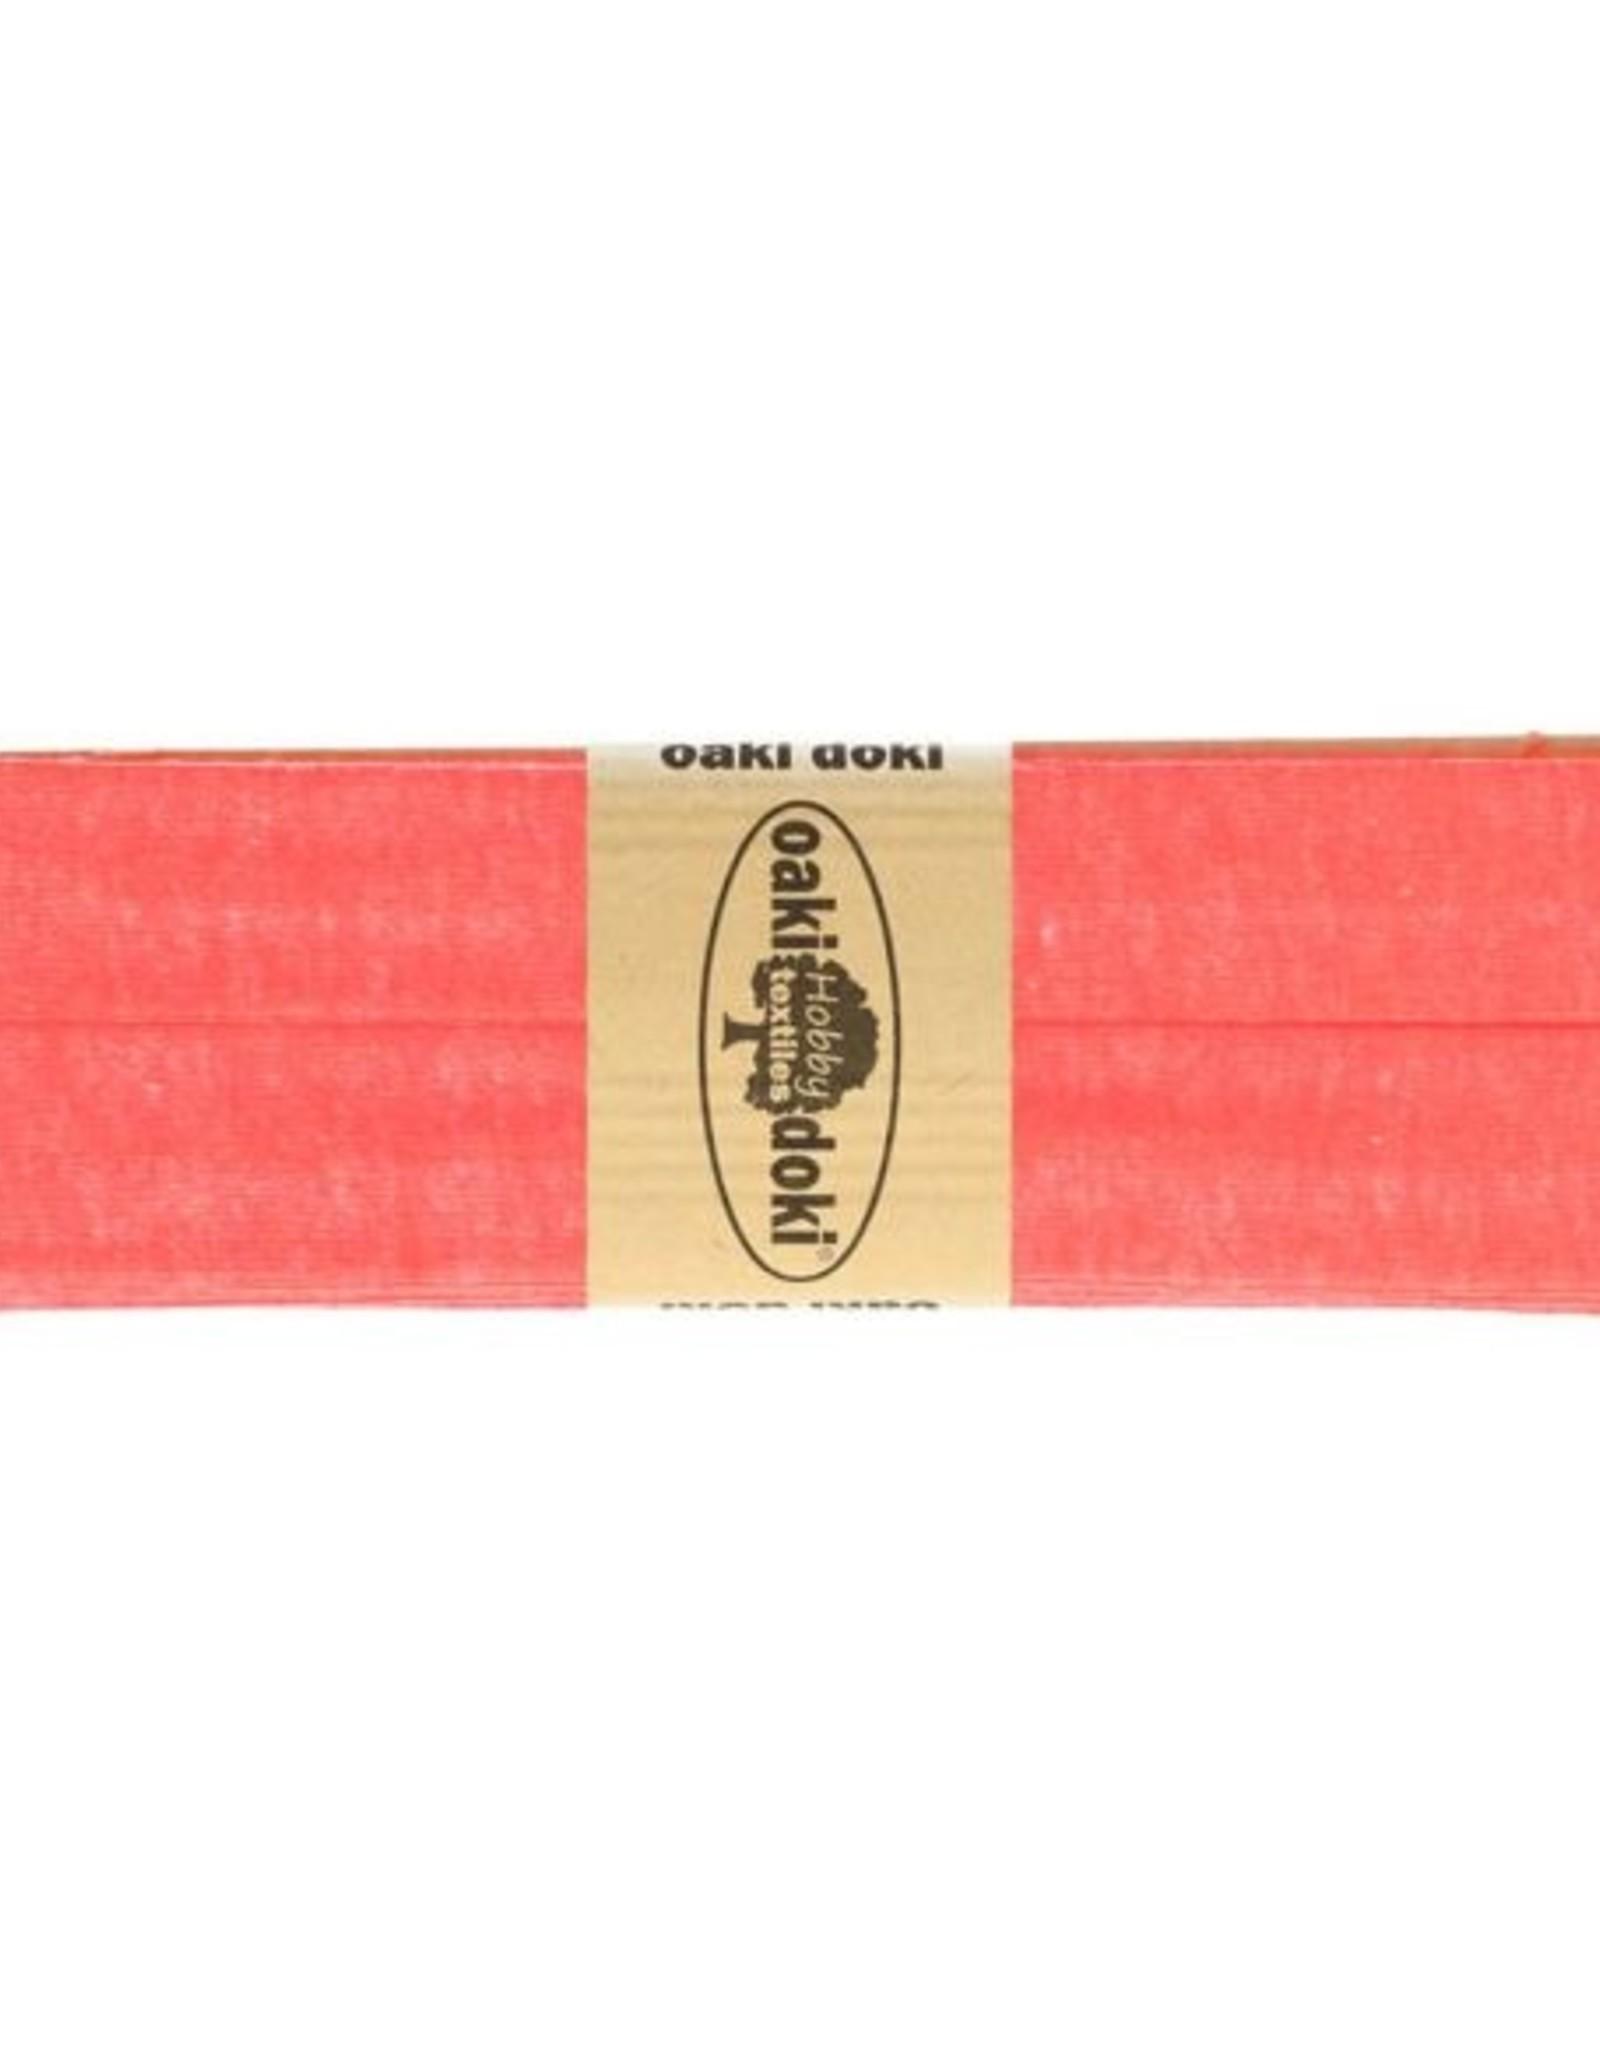 Oaki Doki Tricot de luxe jersey biaisband 20mm x 3m 953